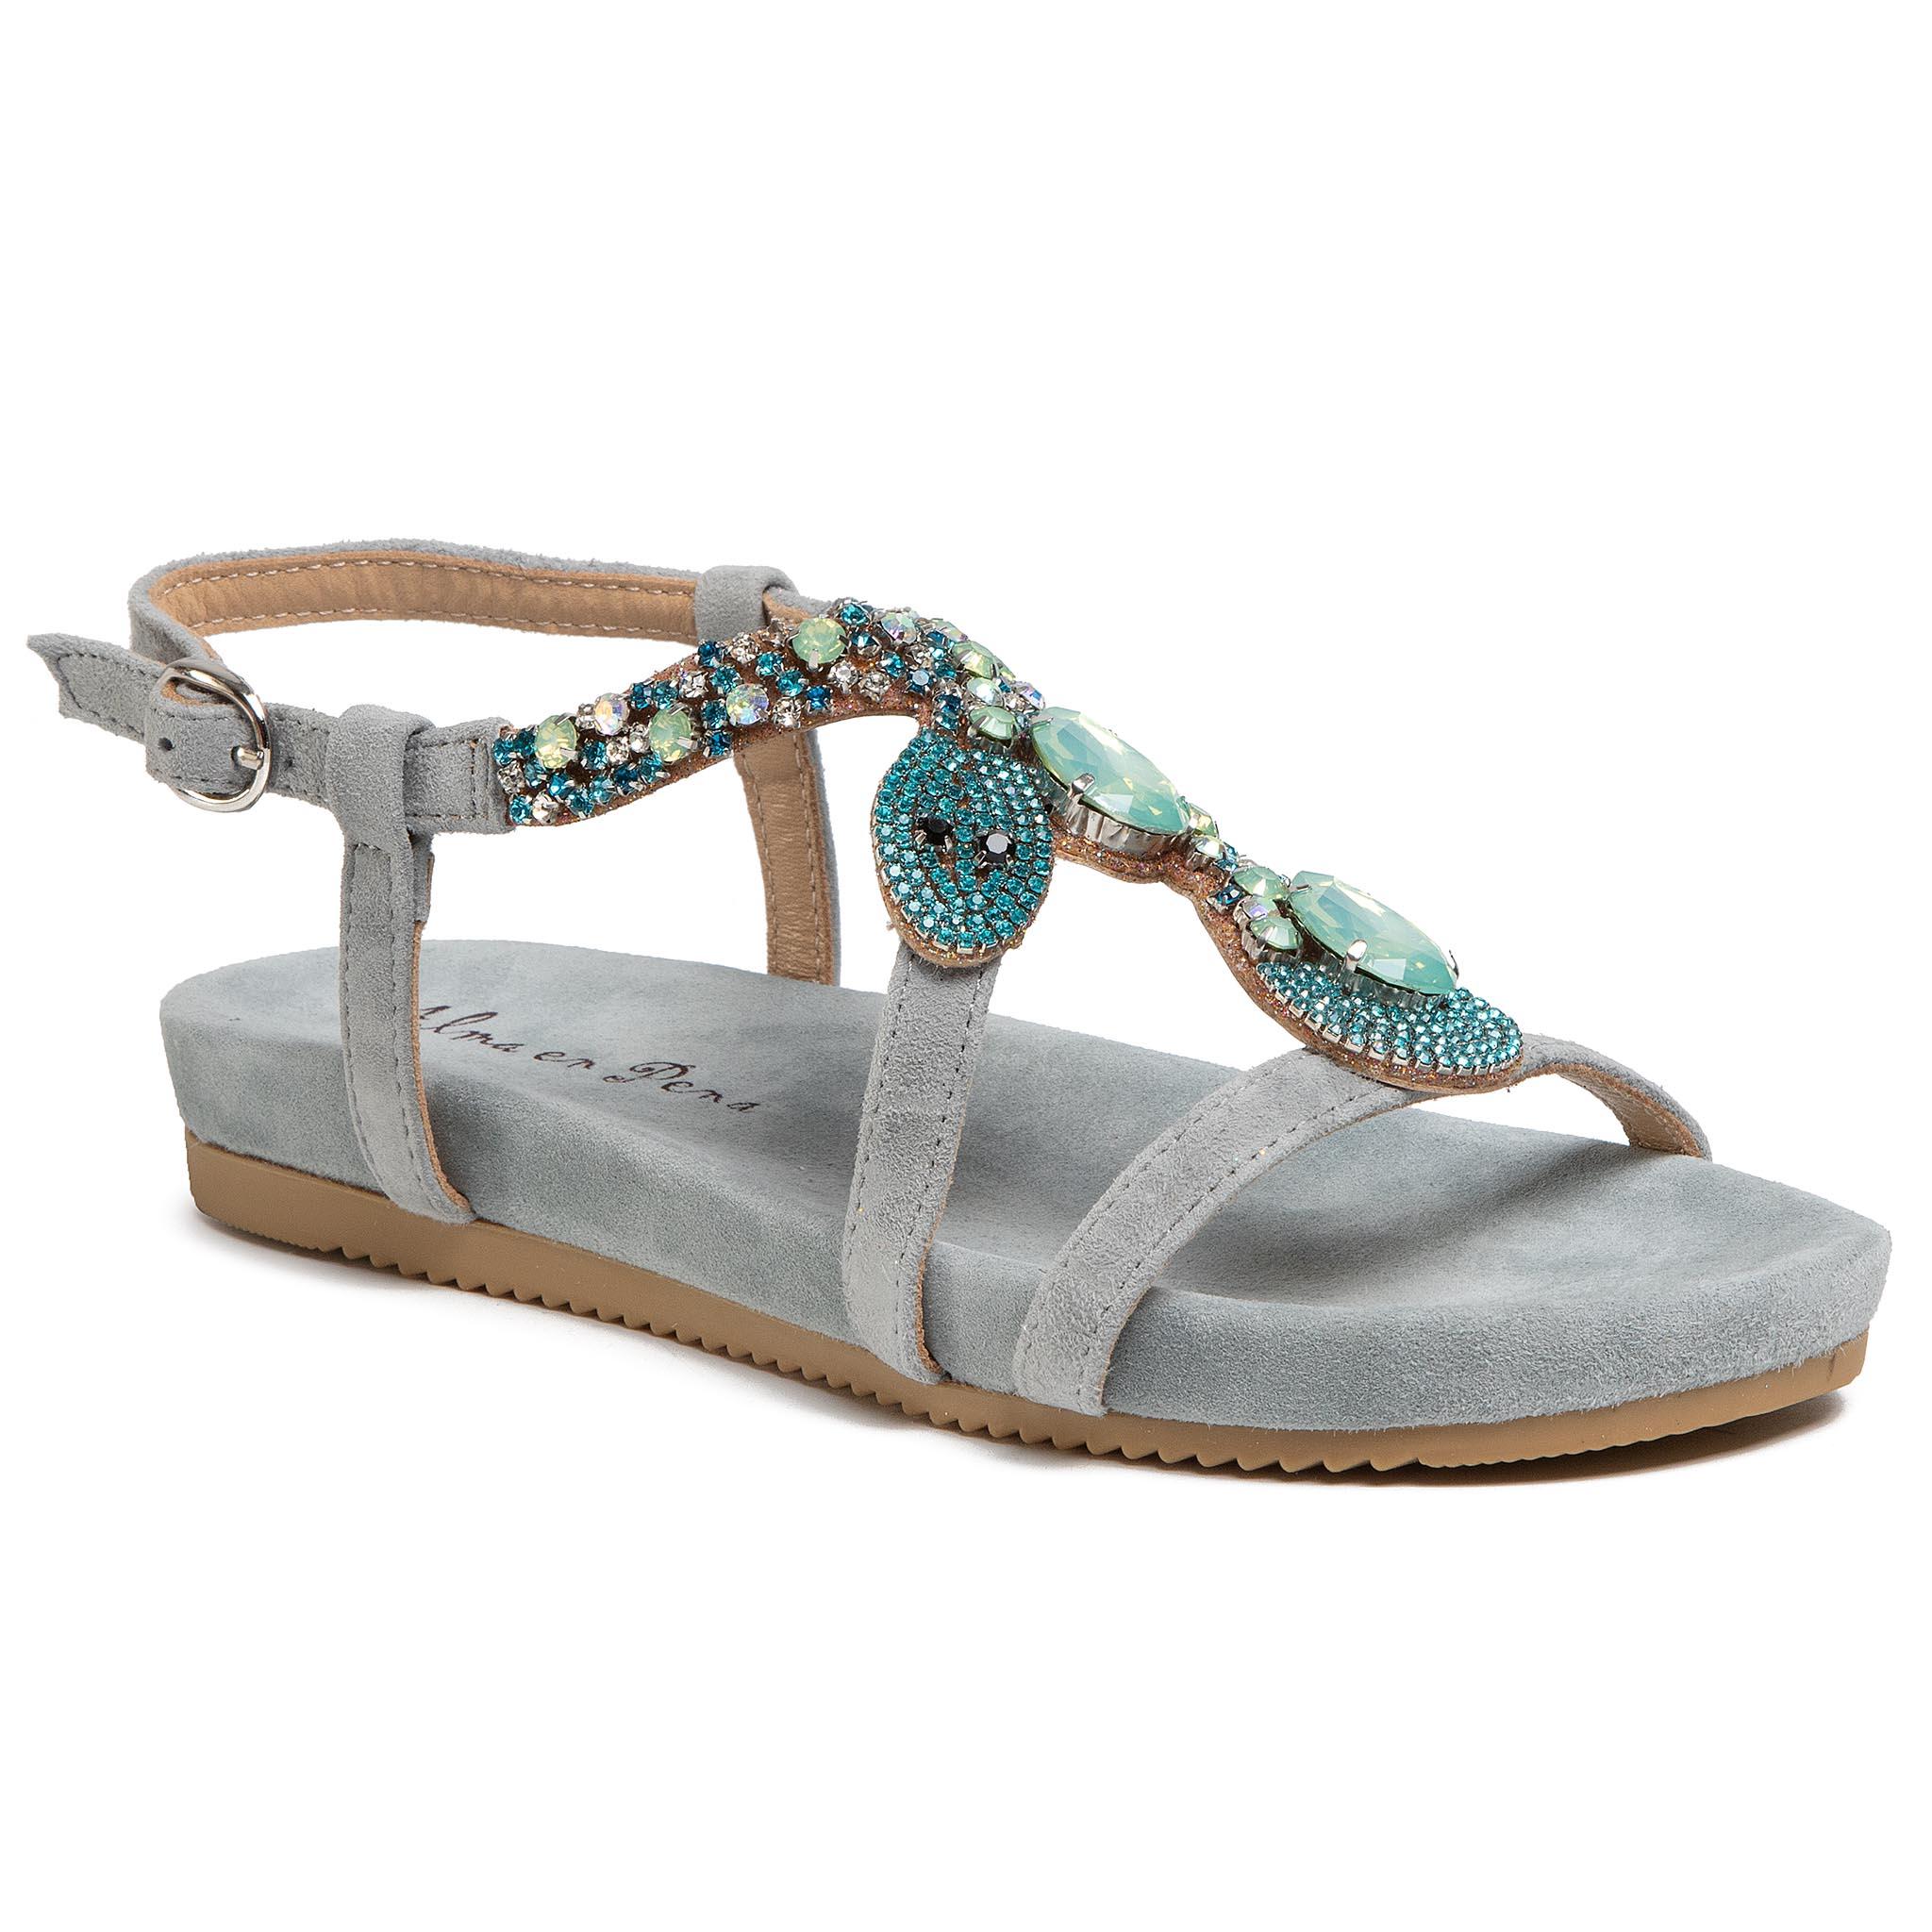 Sandalias ALMA EN PENA - V20846 Suede Jeans